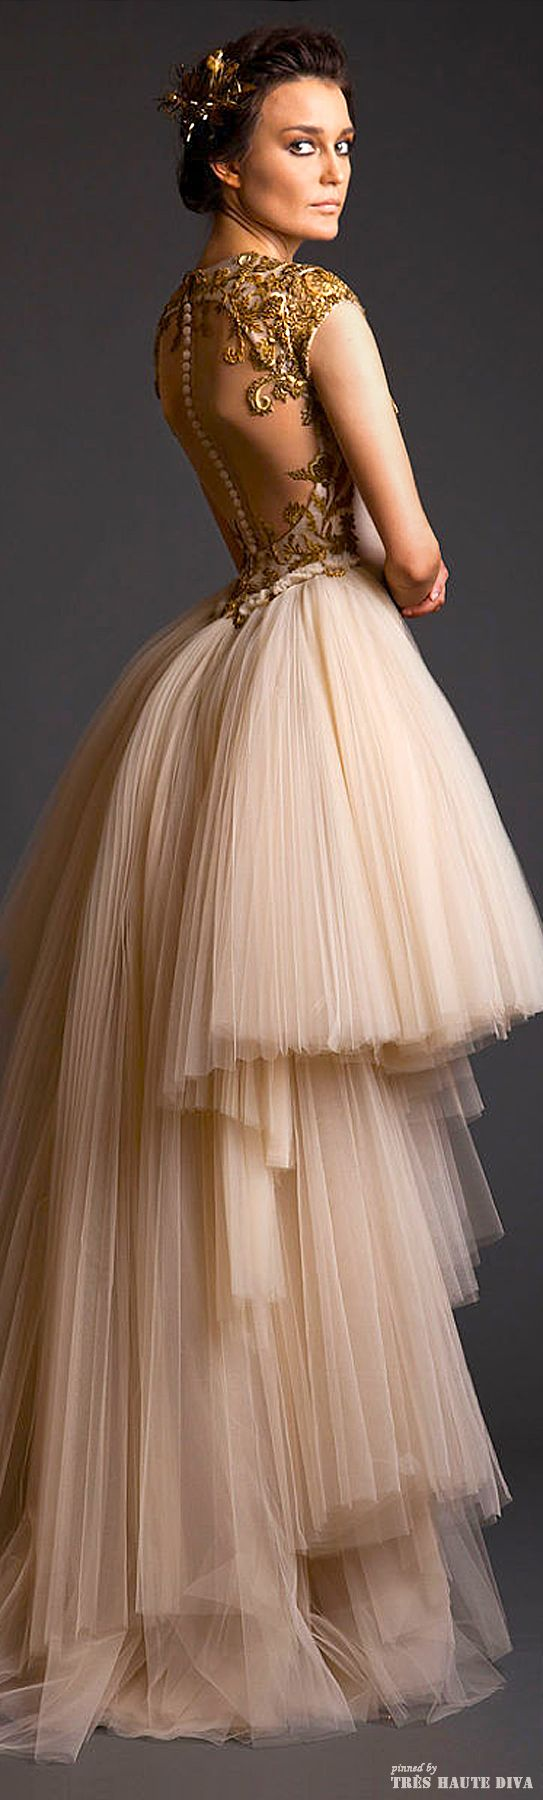 Wedding dress huntsville al   best Wedding Mode images on Pinterest  Wedding ideas Wedding